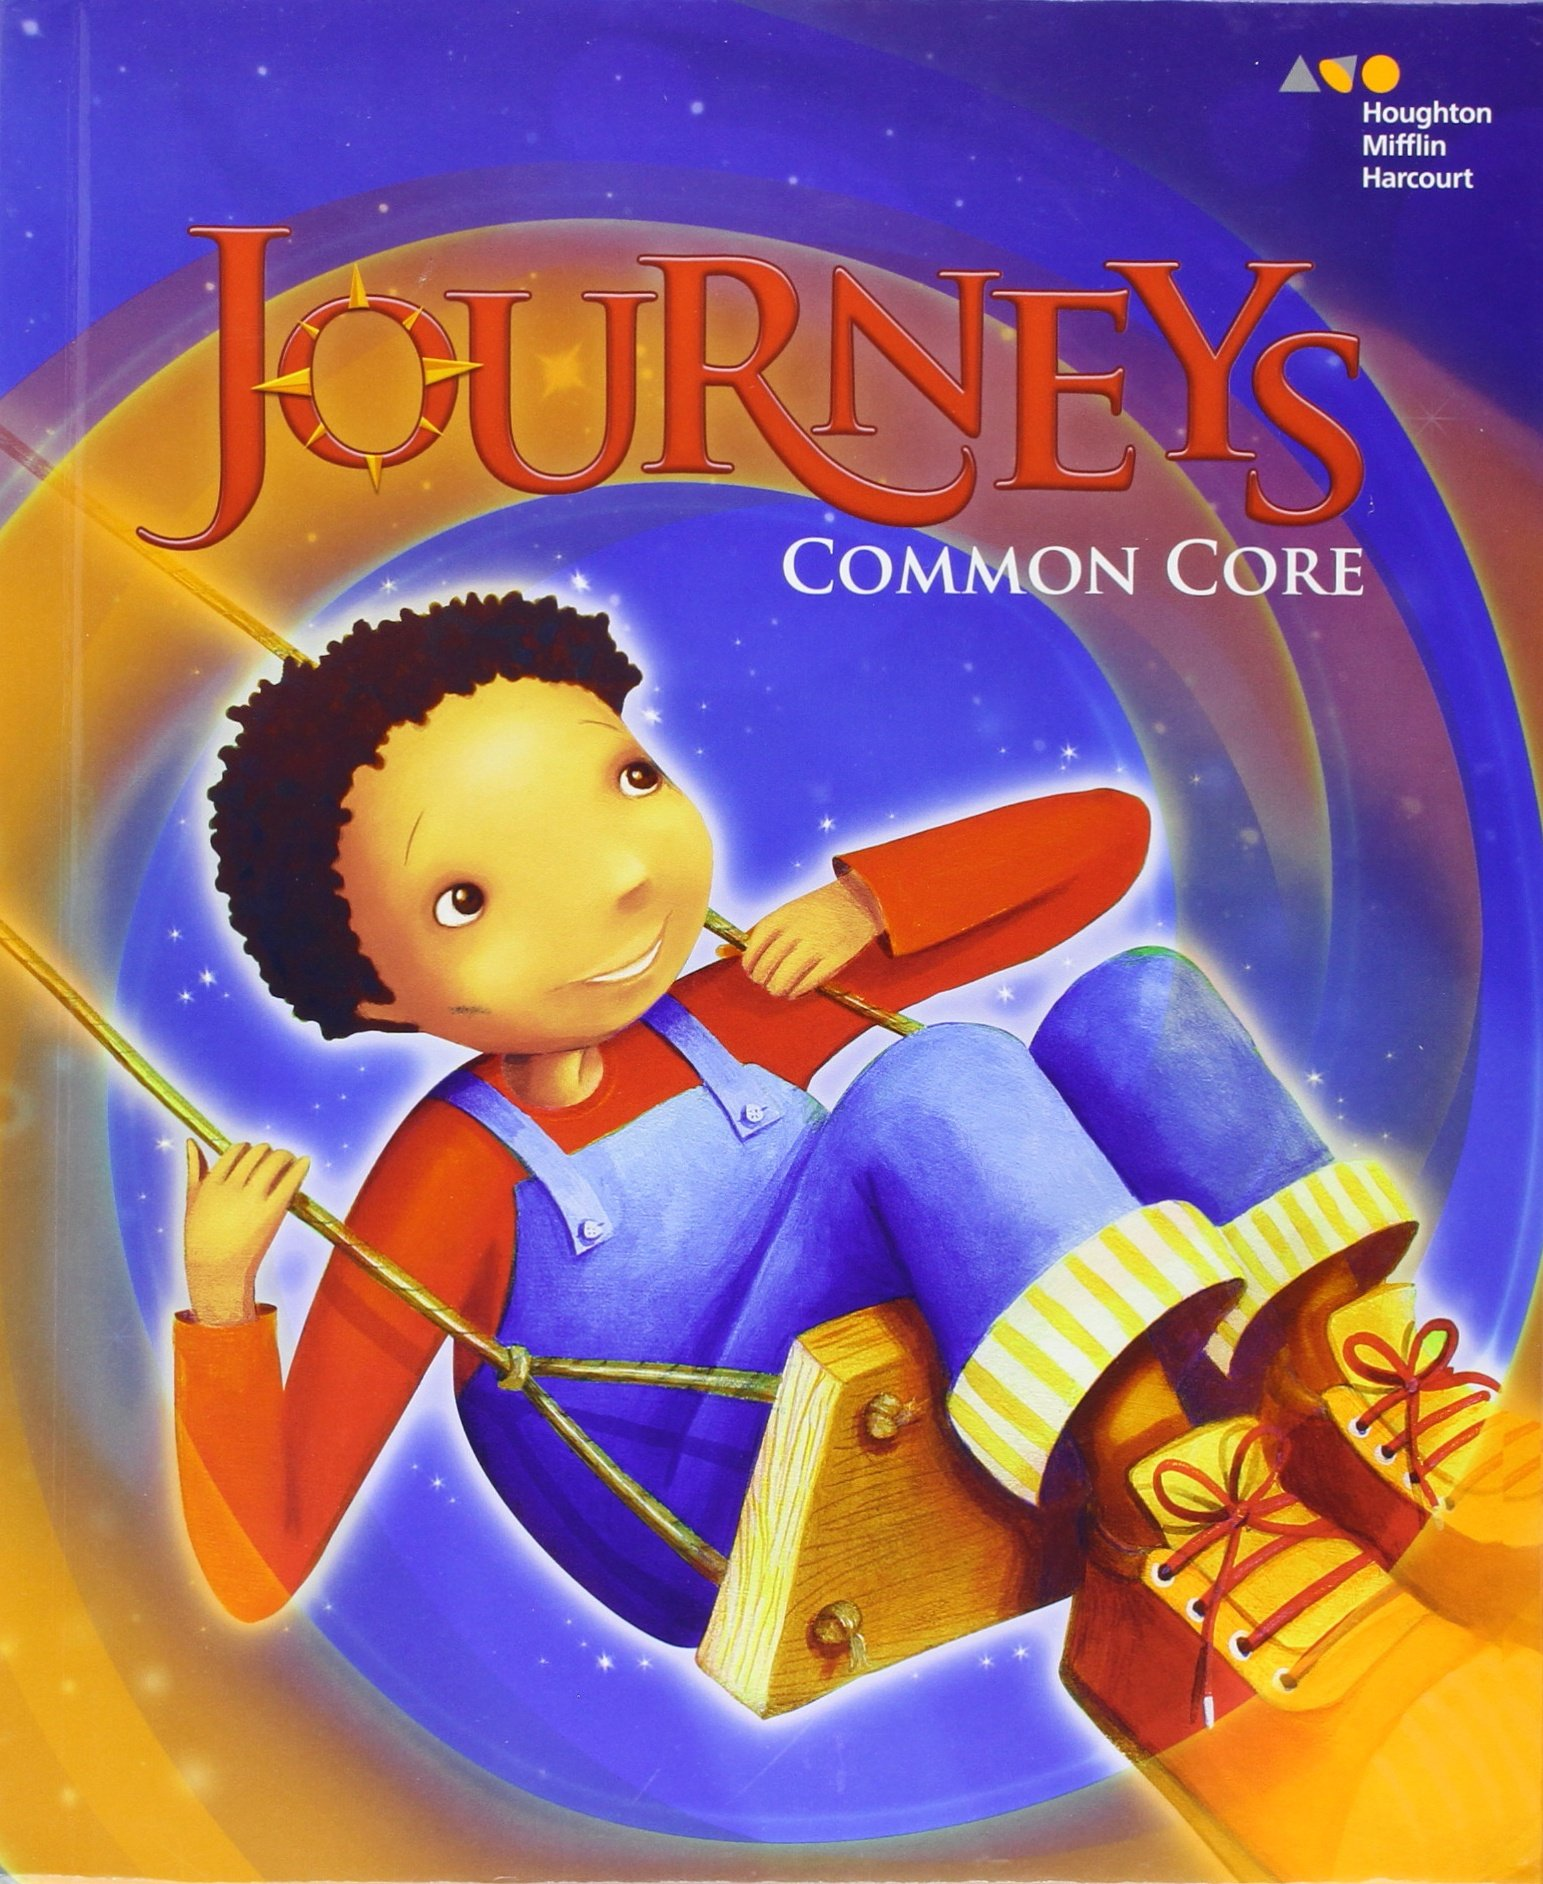 Journeys: Common Core Student Edition Volume 1 Grade 2 2014 by HOUGHTON MIFFLIN HARCOURT